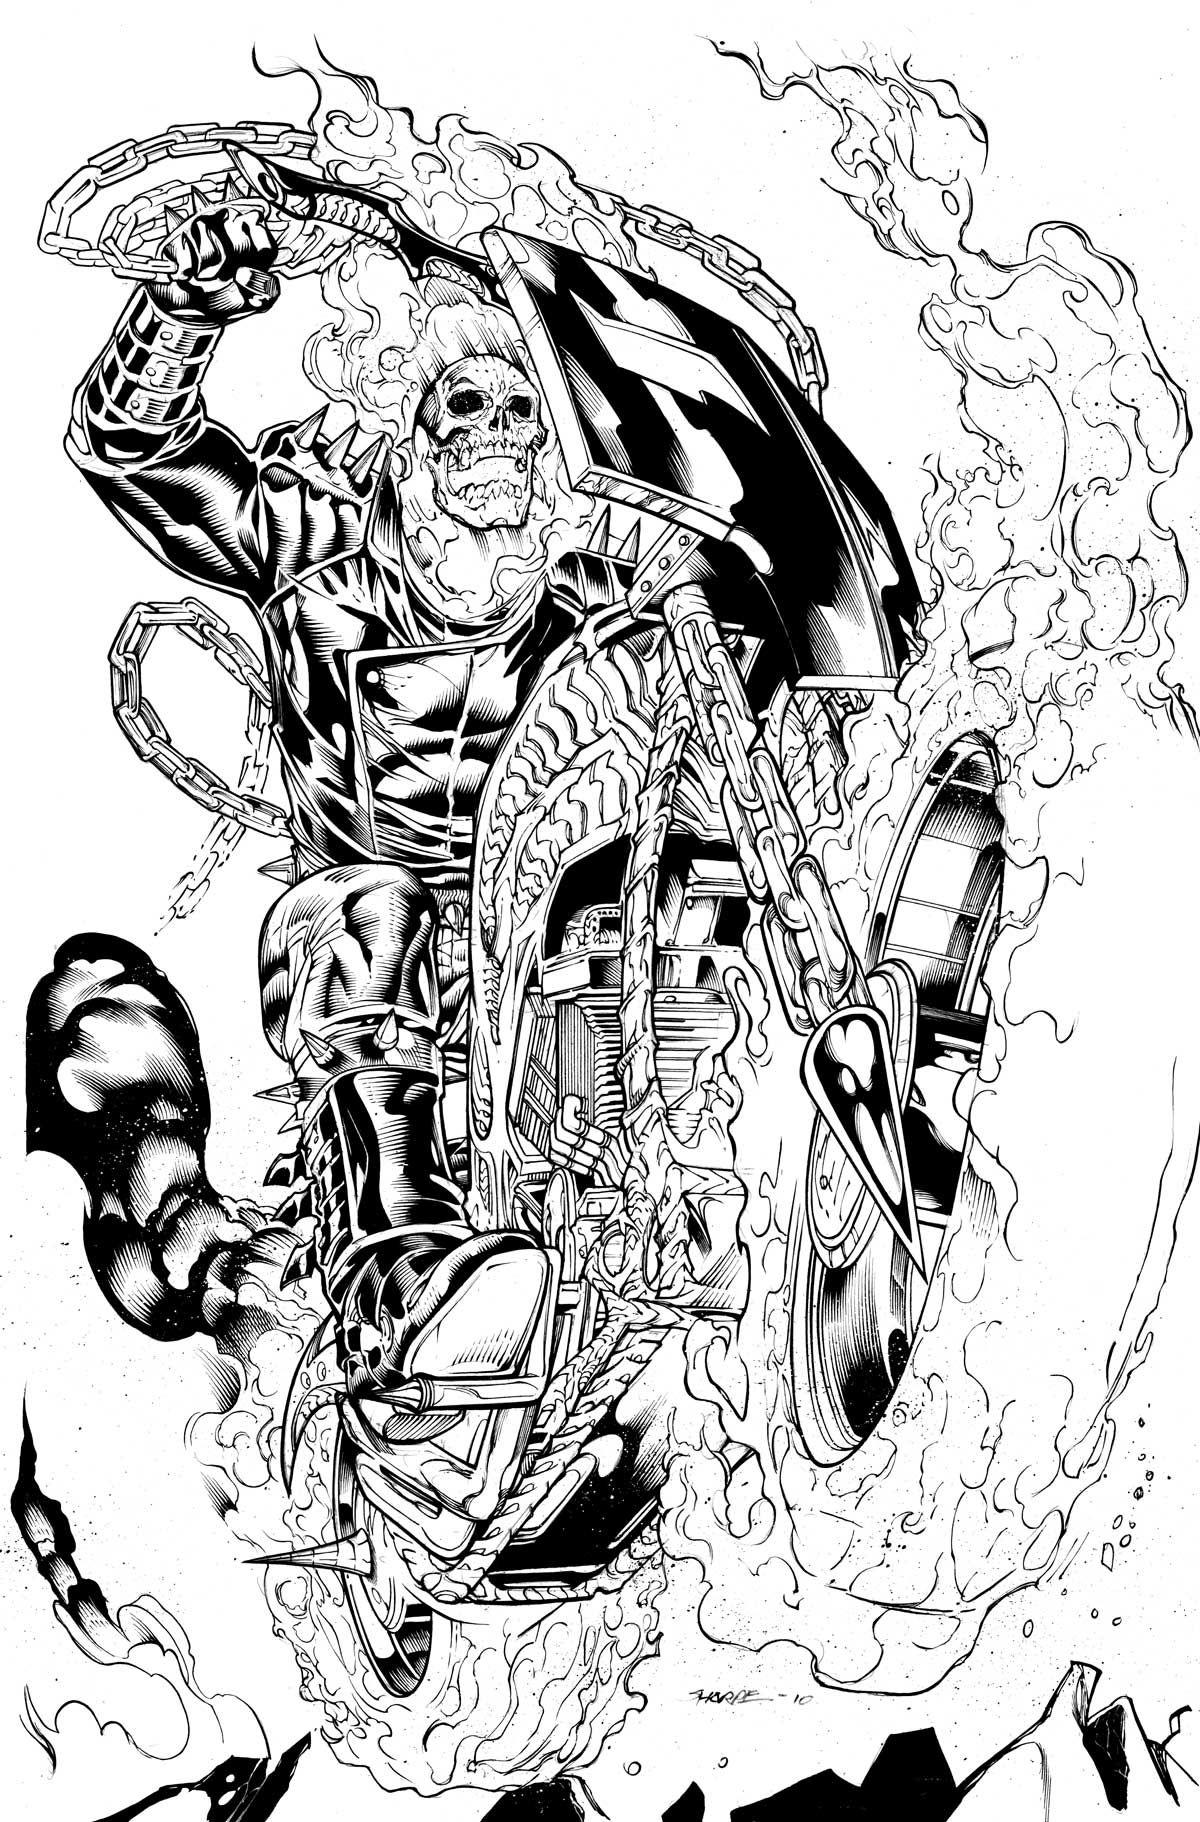 Ghost rider alone by marcdeering on deviantart